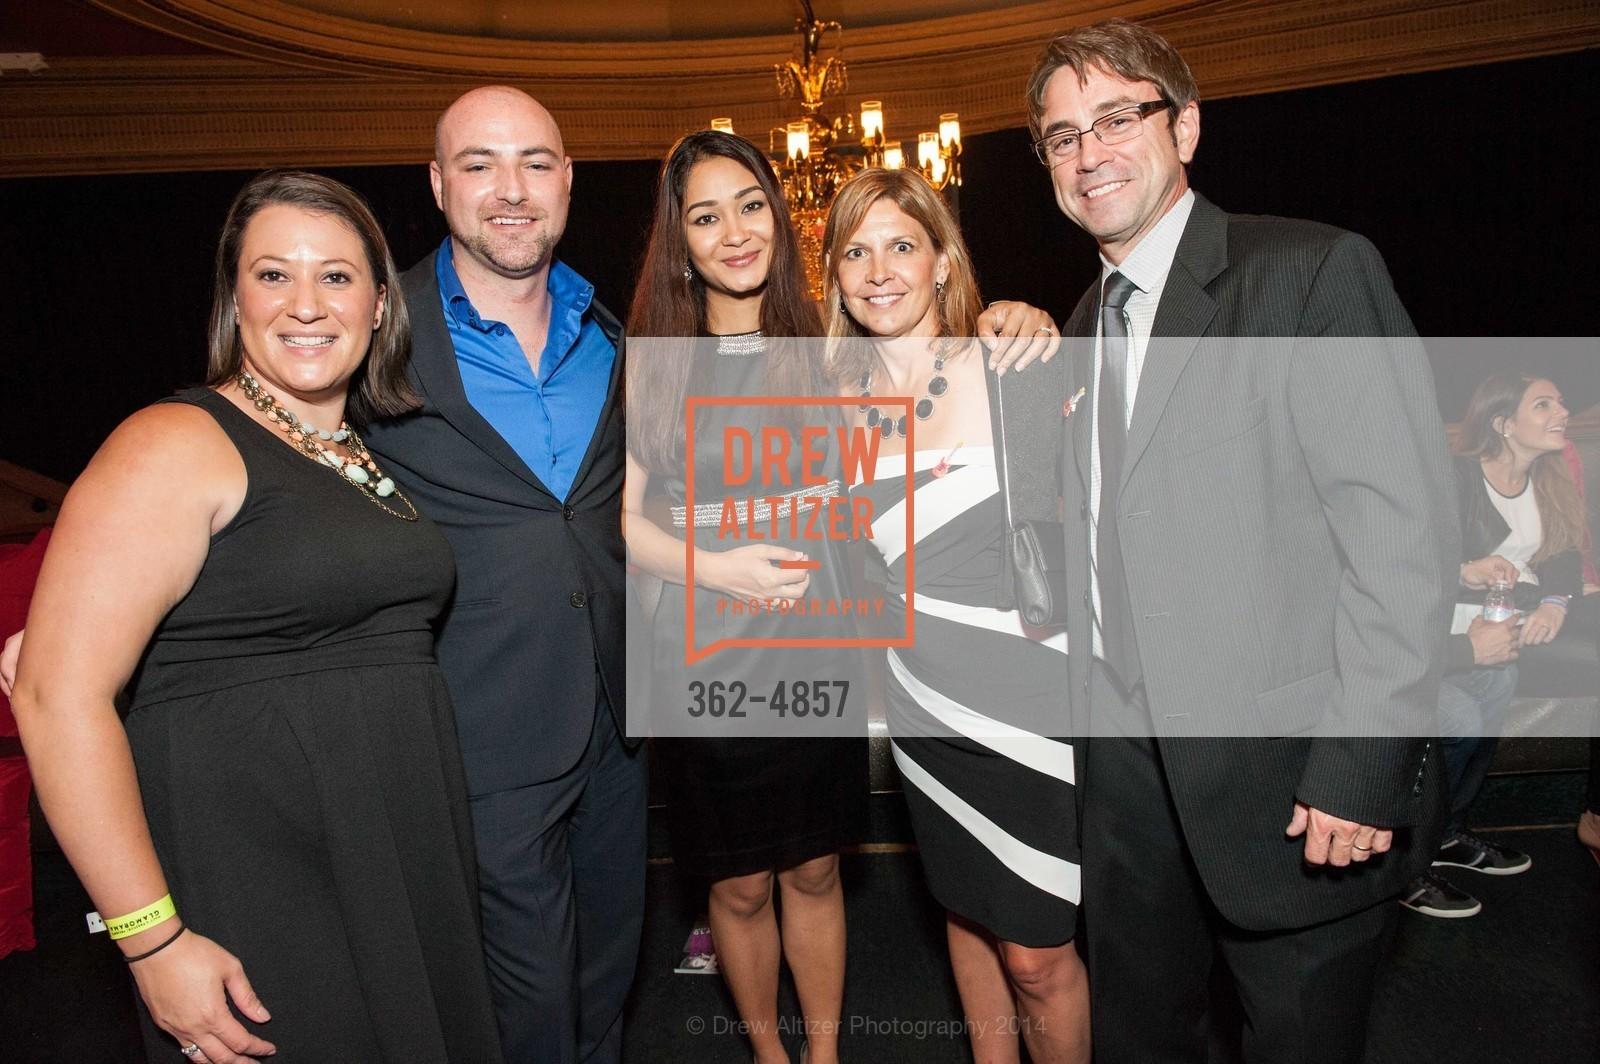 Olga Brezow, James O'Connor, Palladi Brua, Jenny Wilkie, Rob Lisch, Photo #362-4857